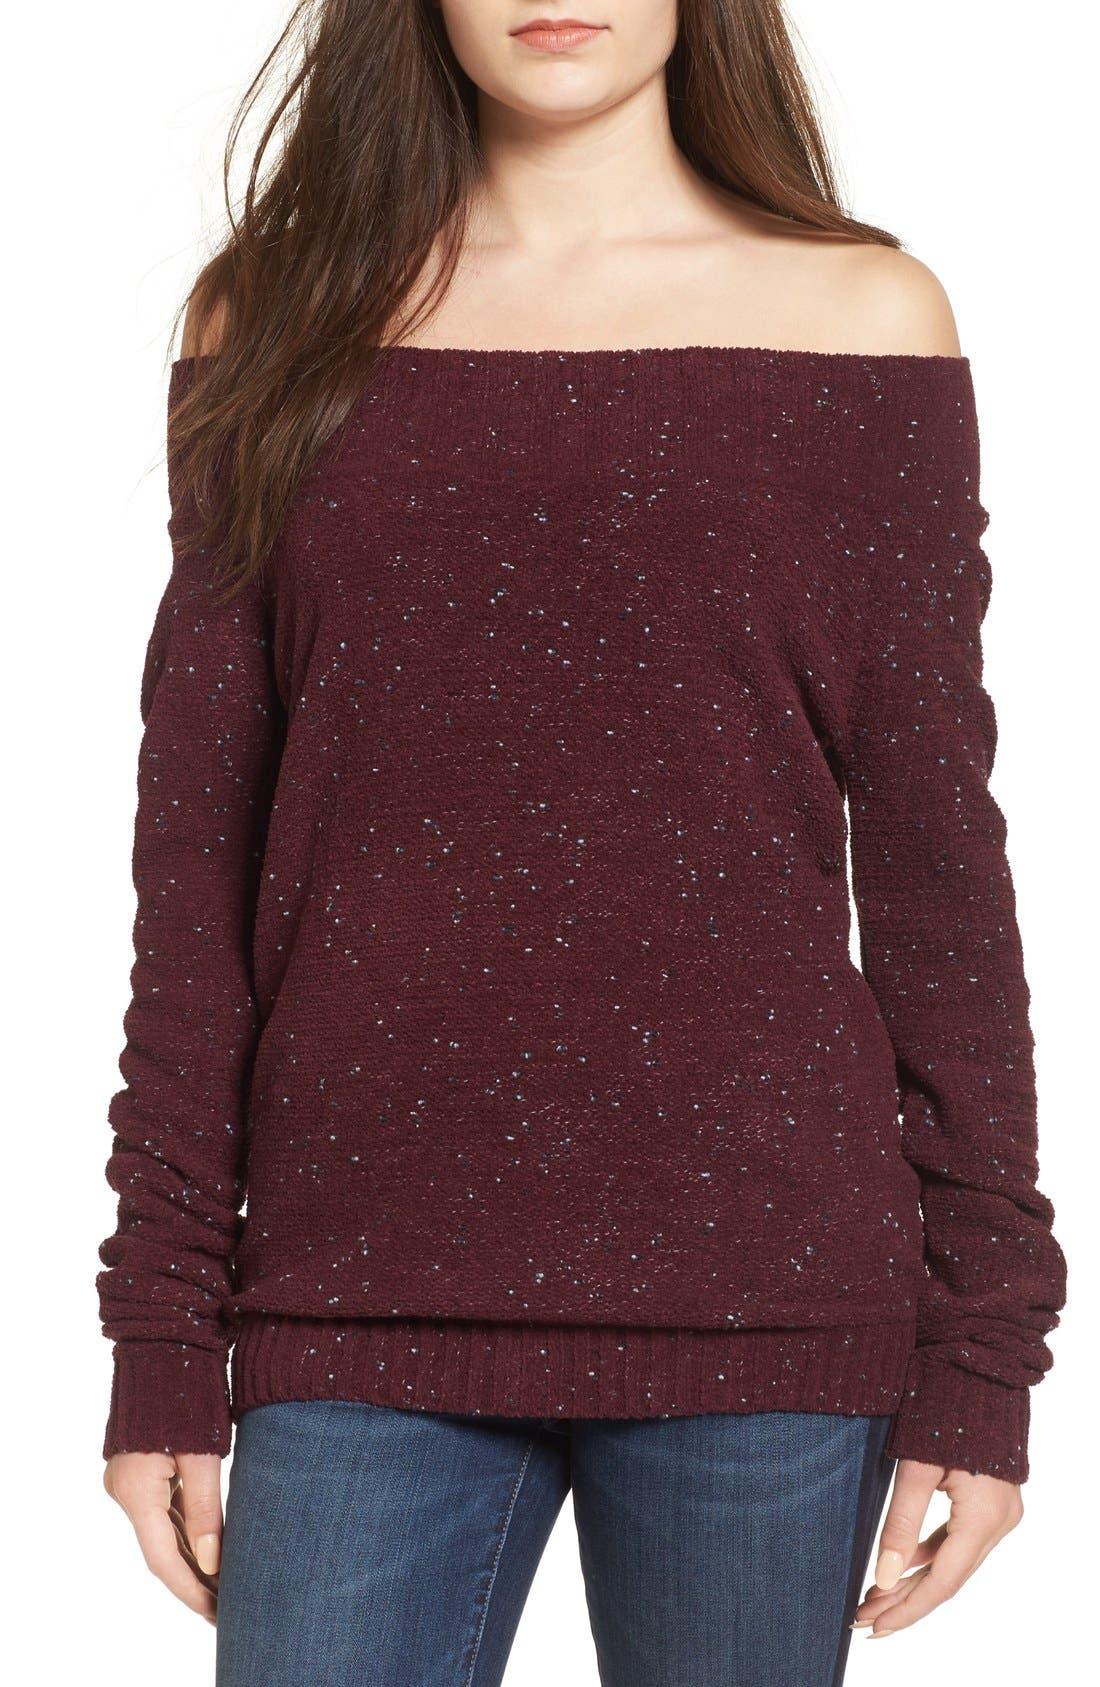 'Marilyn' Sweater,                             Main thumbnail 1, color,                             Burgundy Stem Chenille Combo